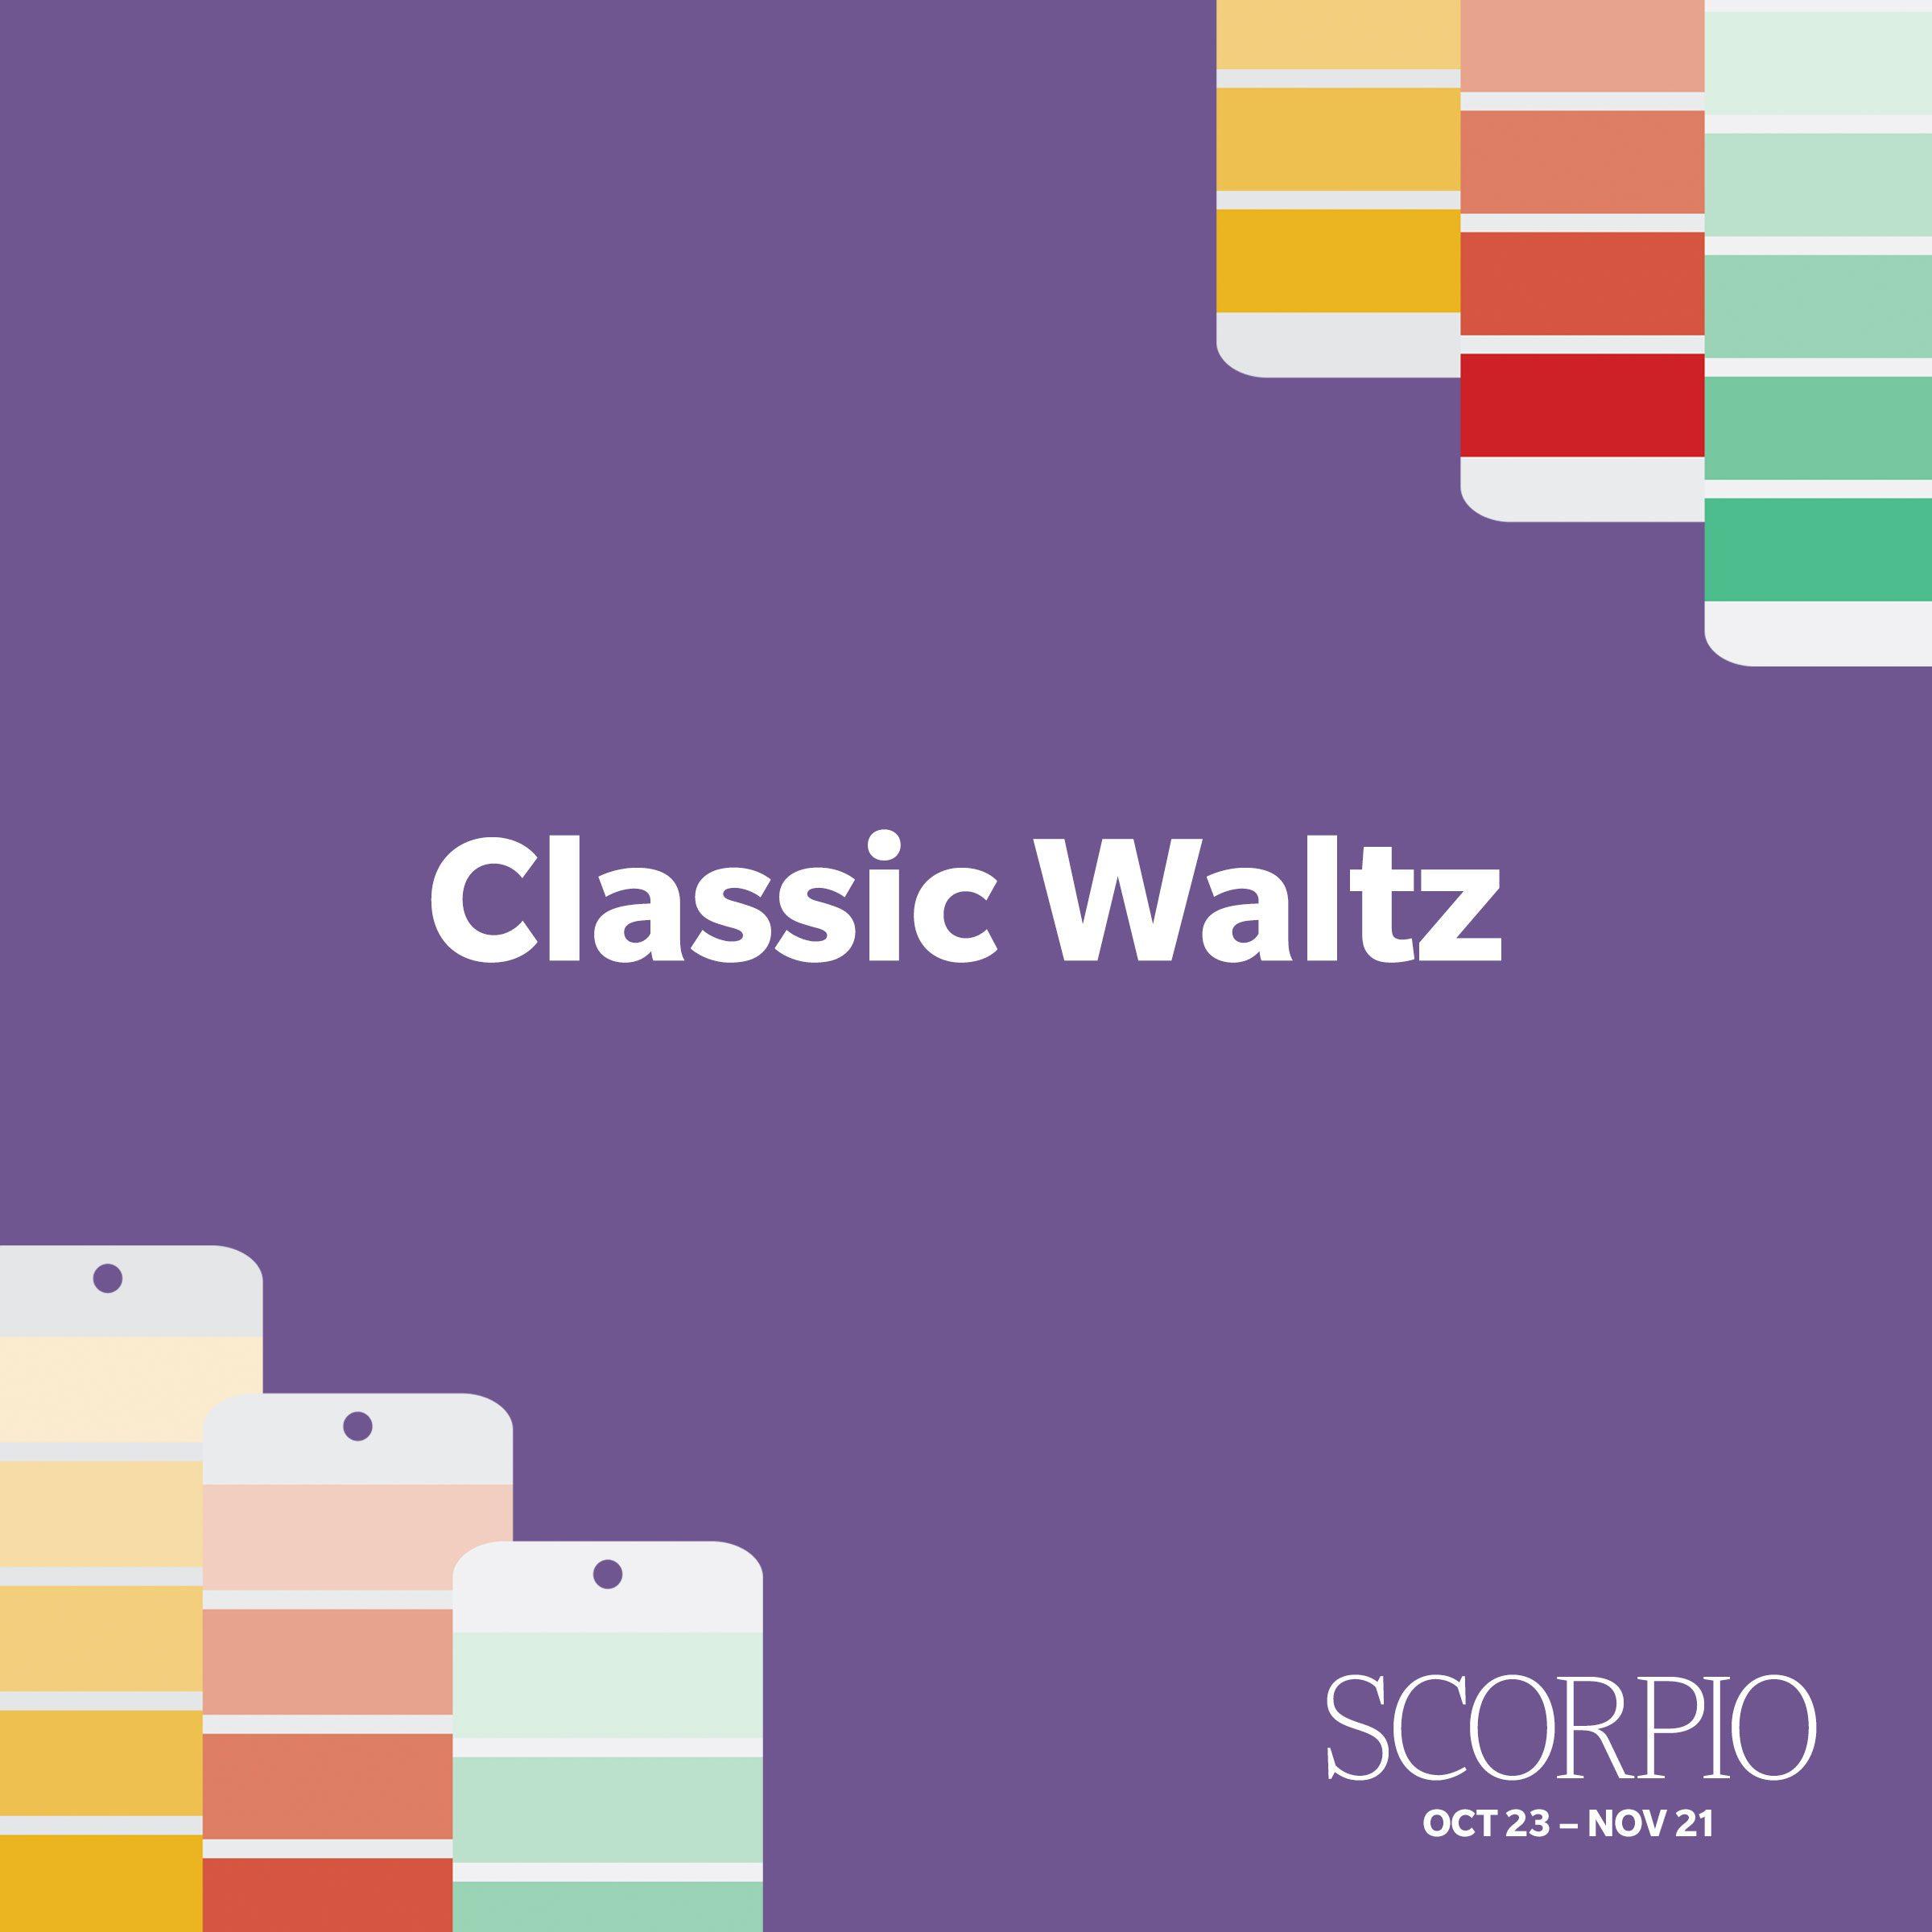 Scorpio-ClassicWaltz